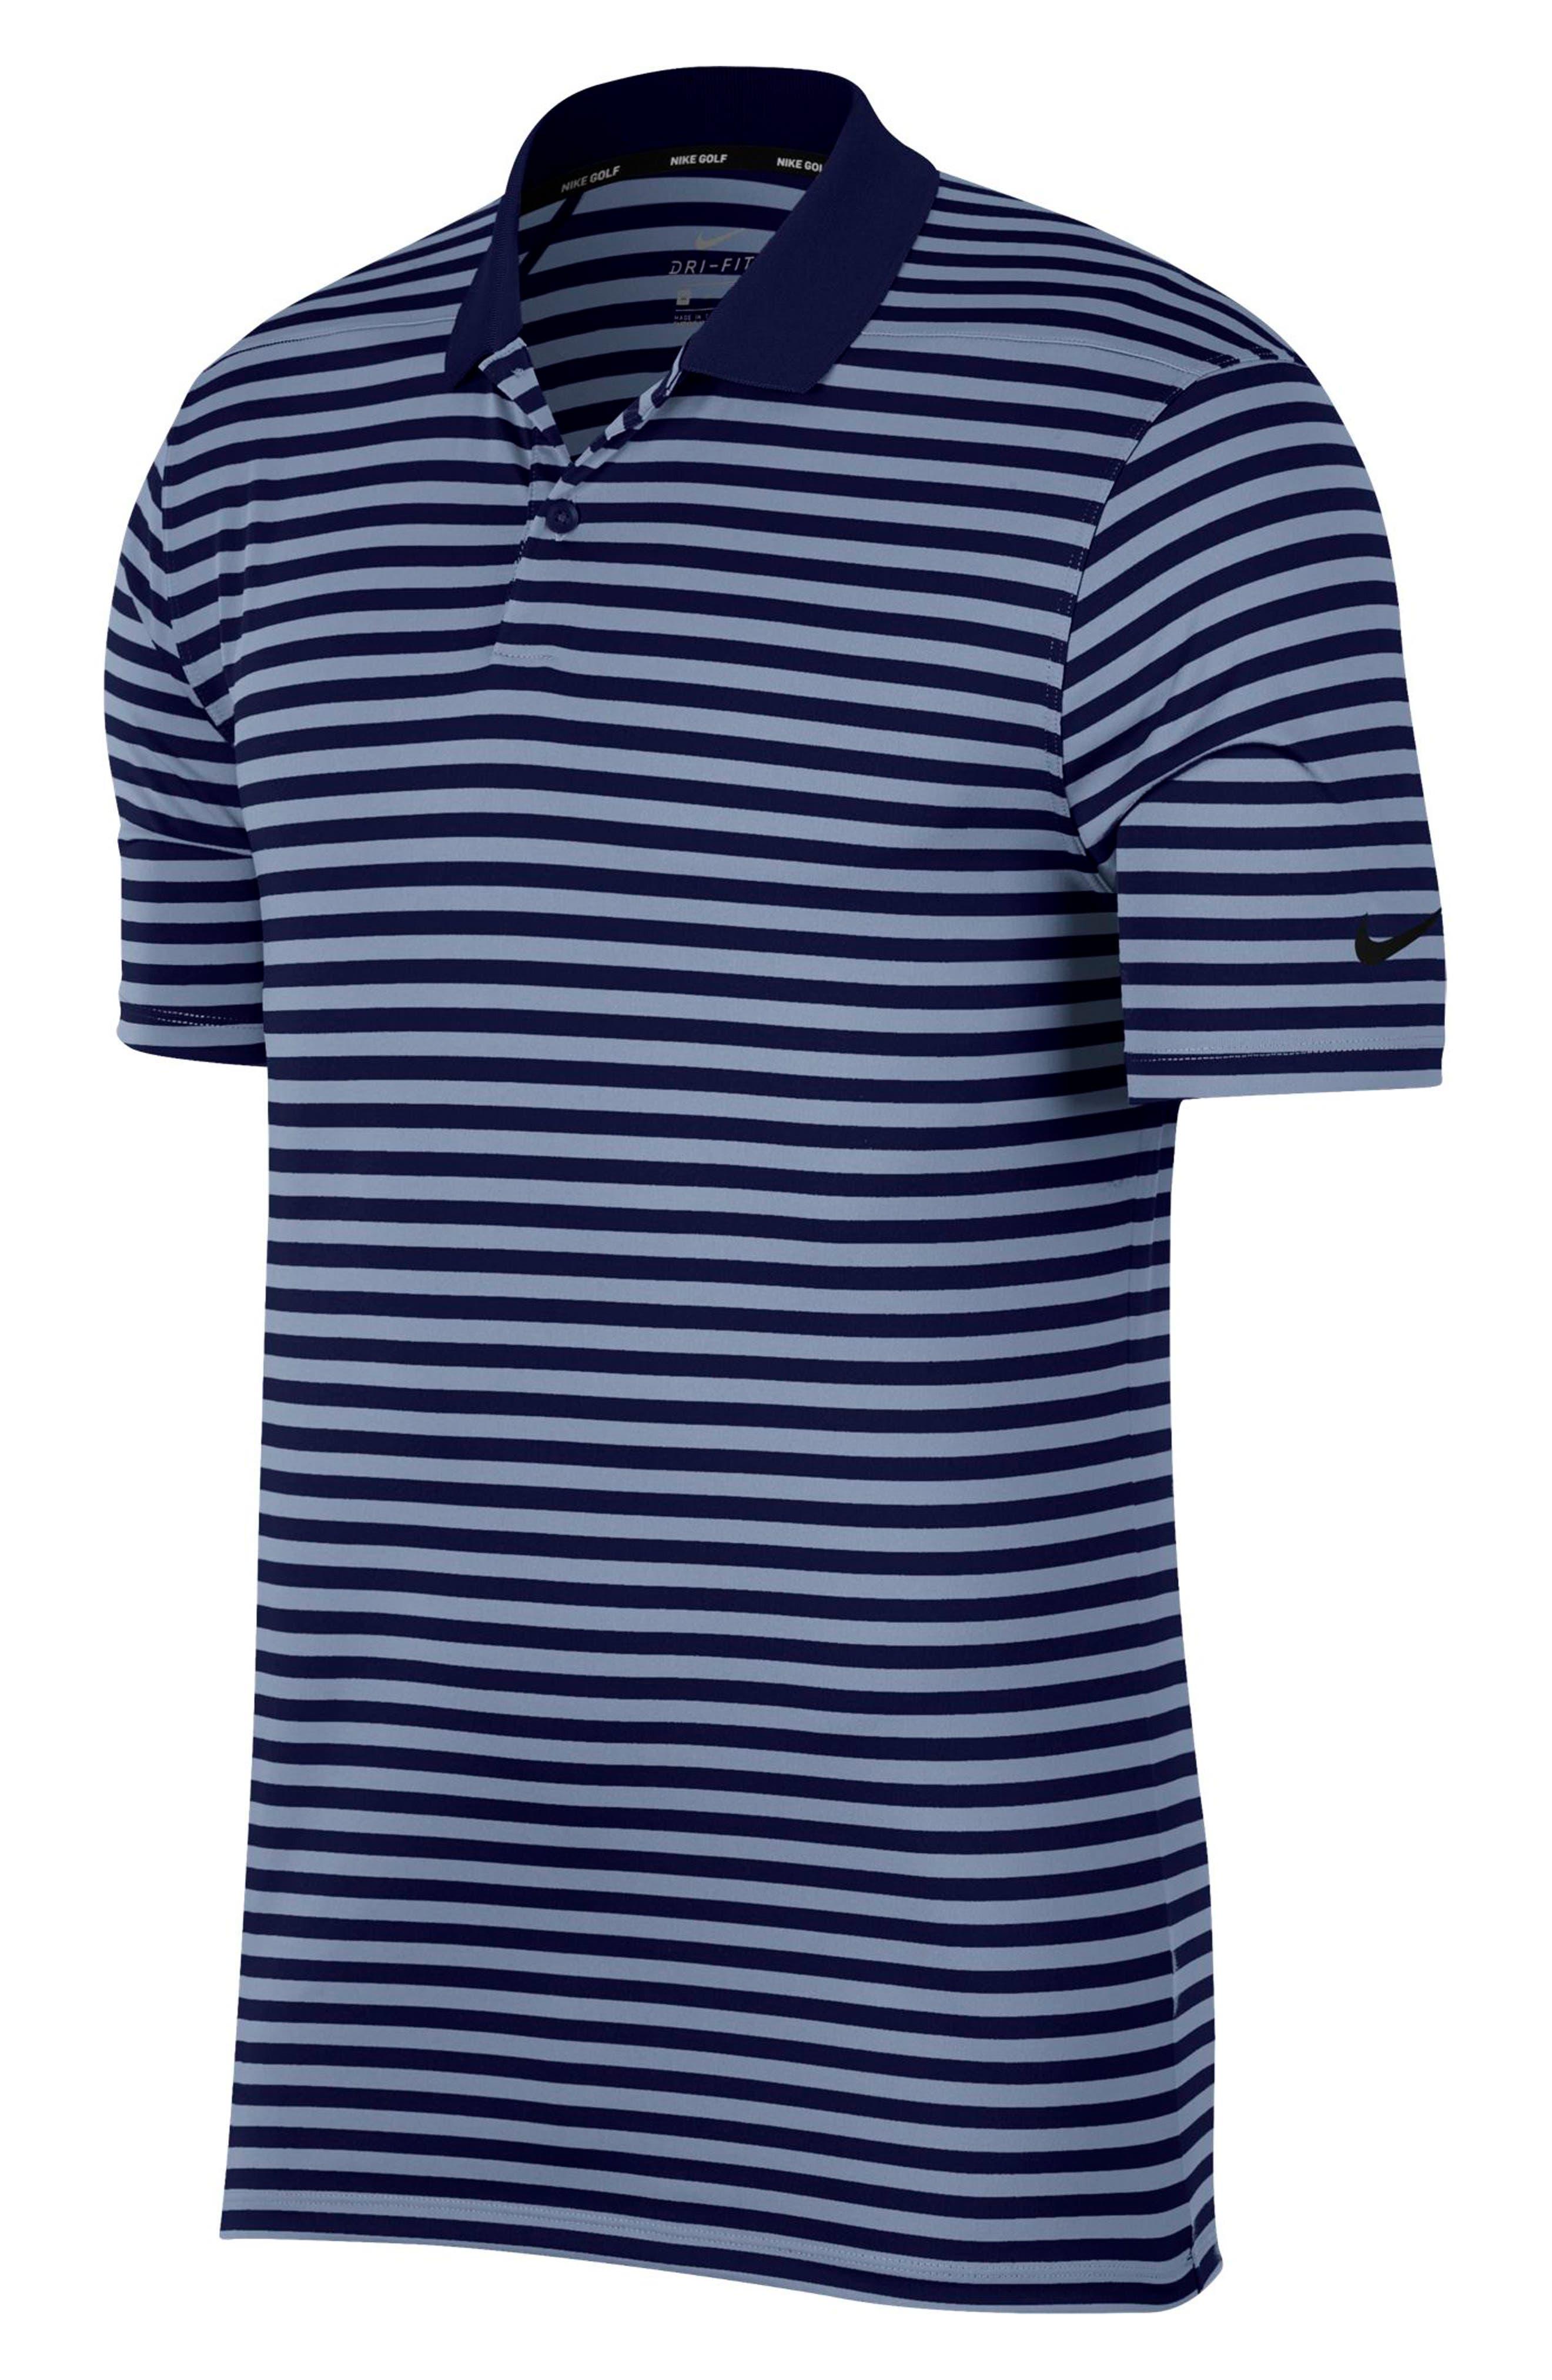 a40f20cf Men's Nike Polo Shirts | Nordstrom